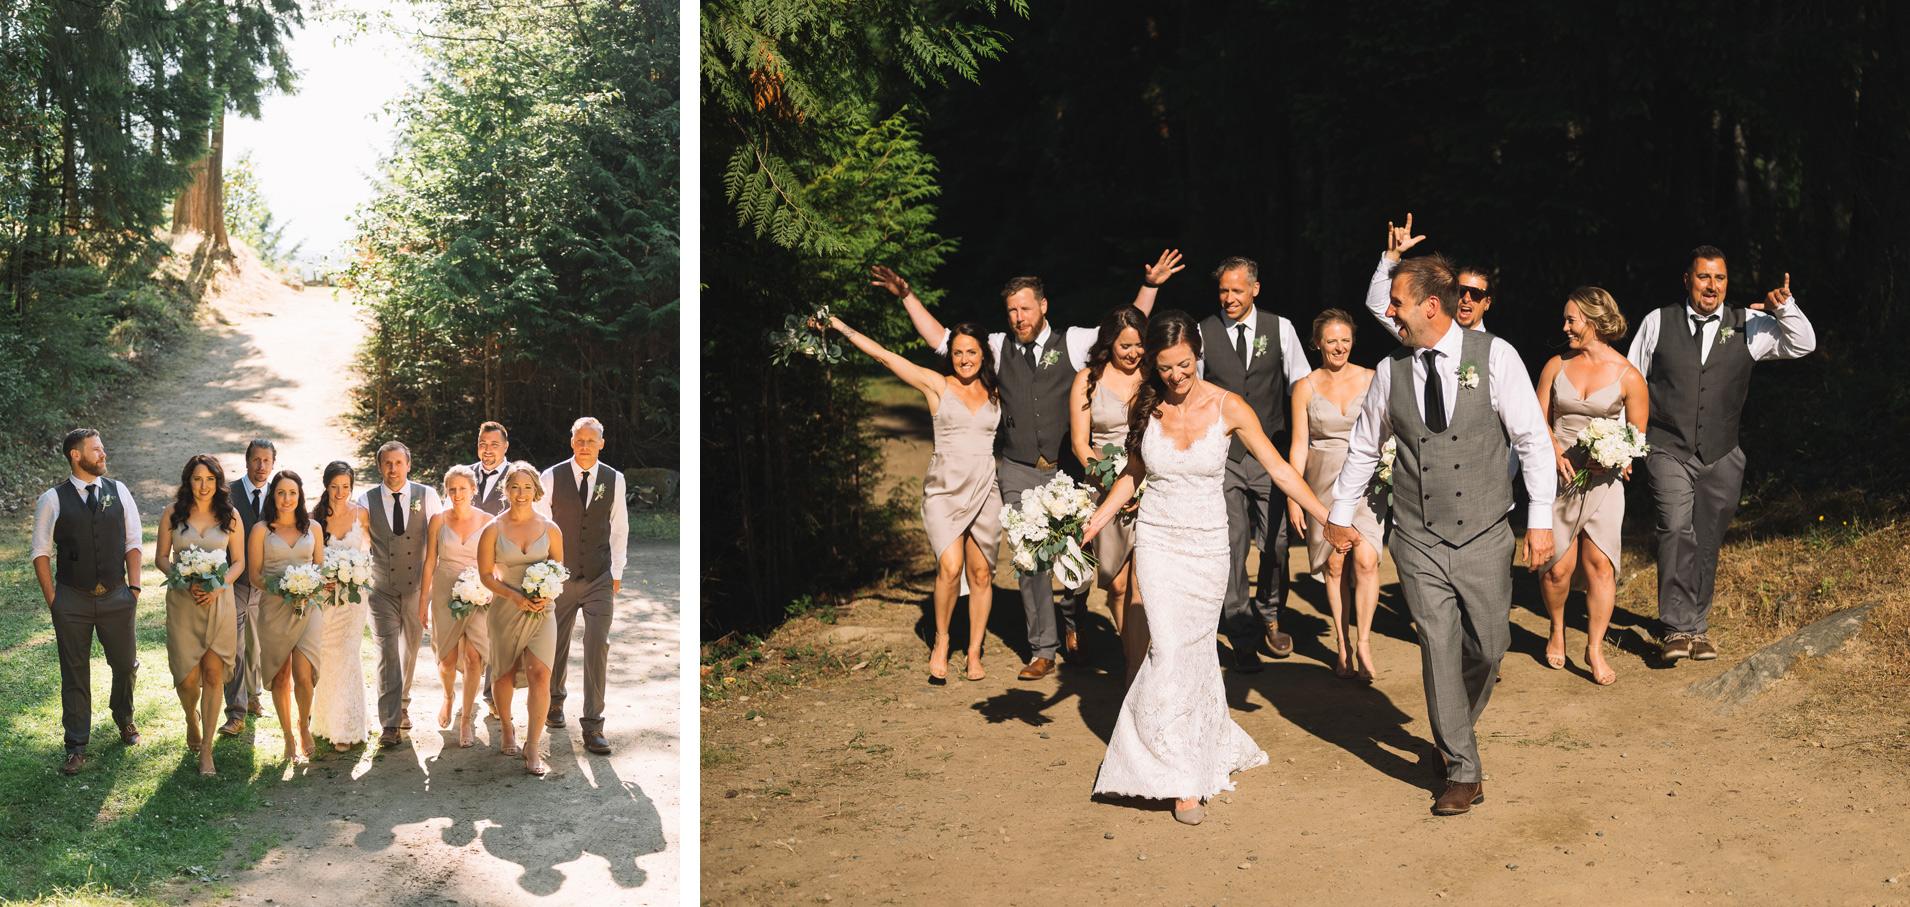 Bodega Ridge Bridal Party